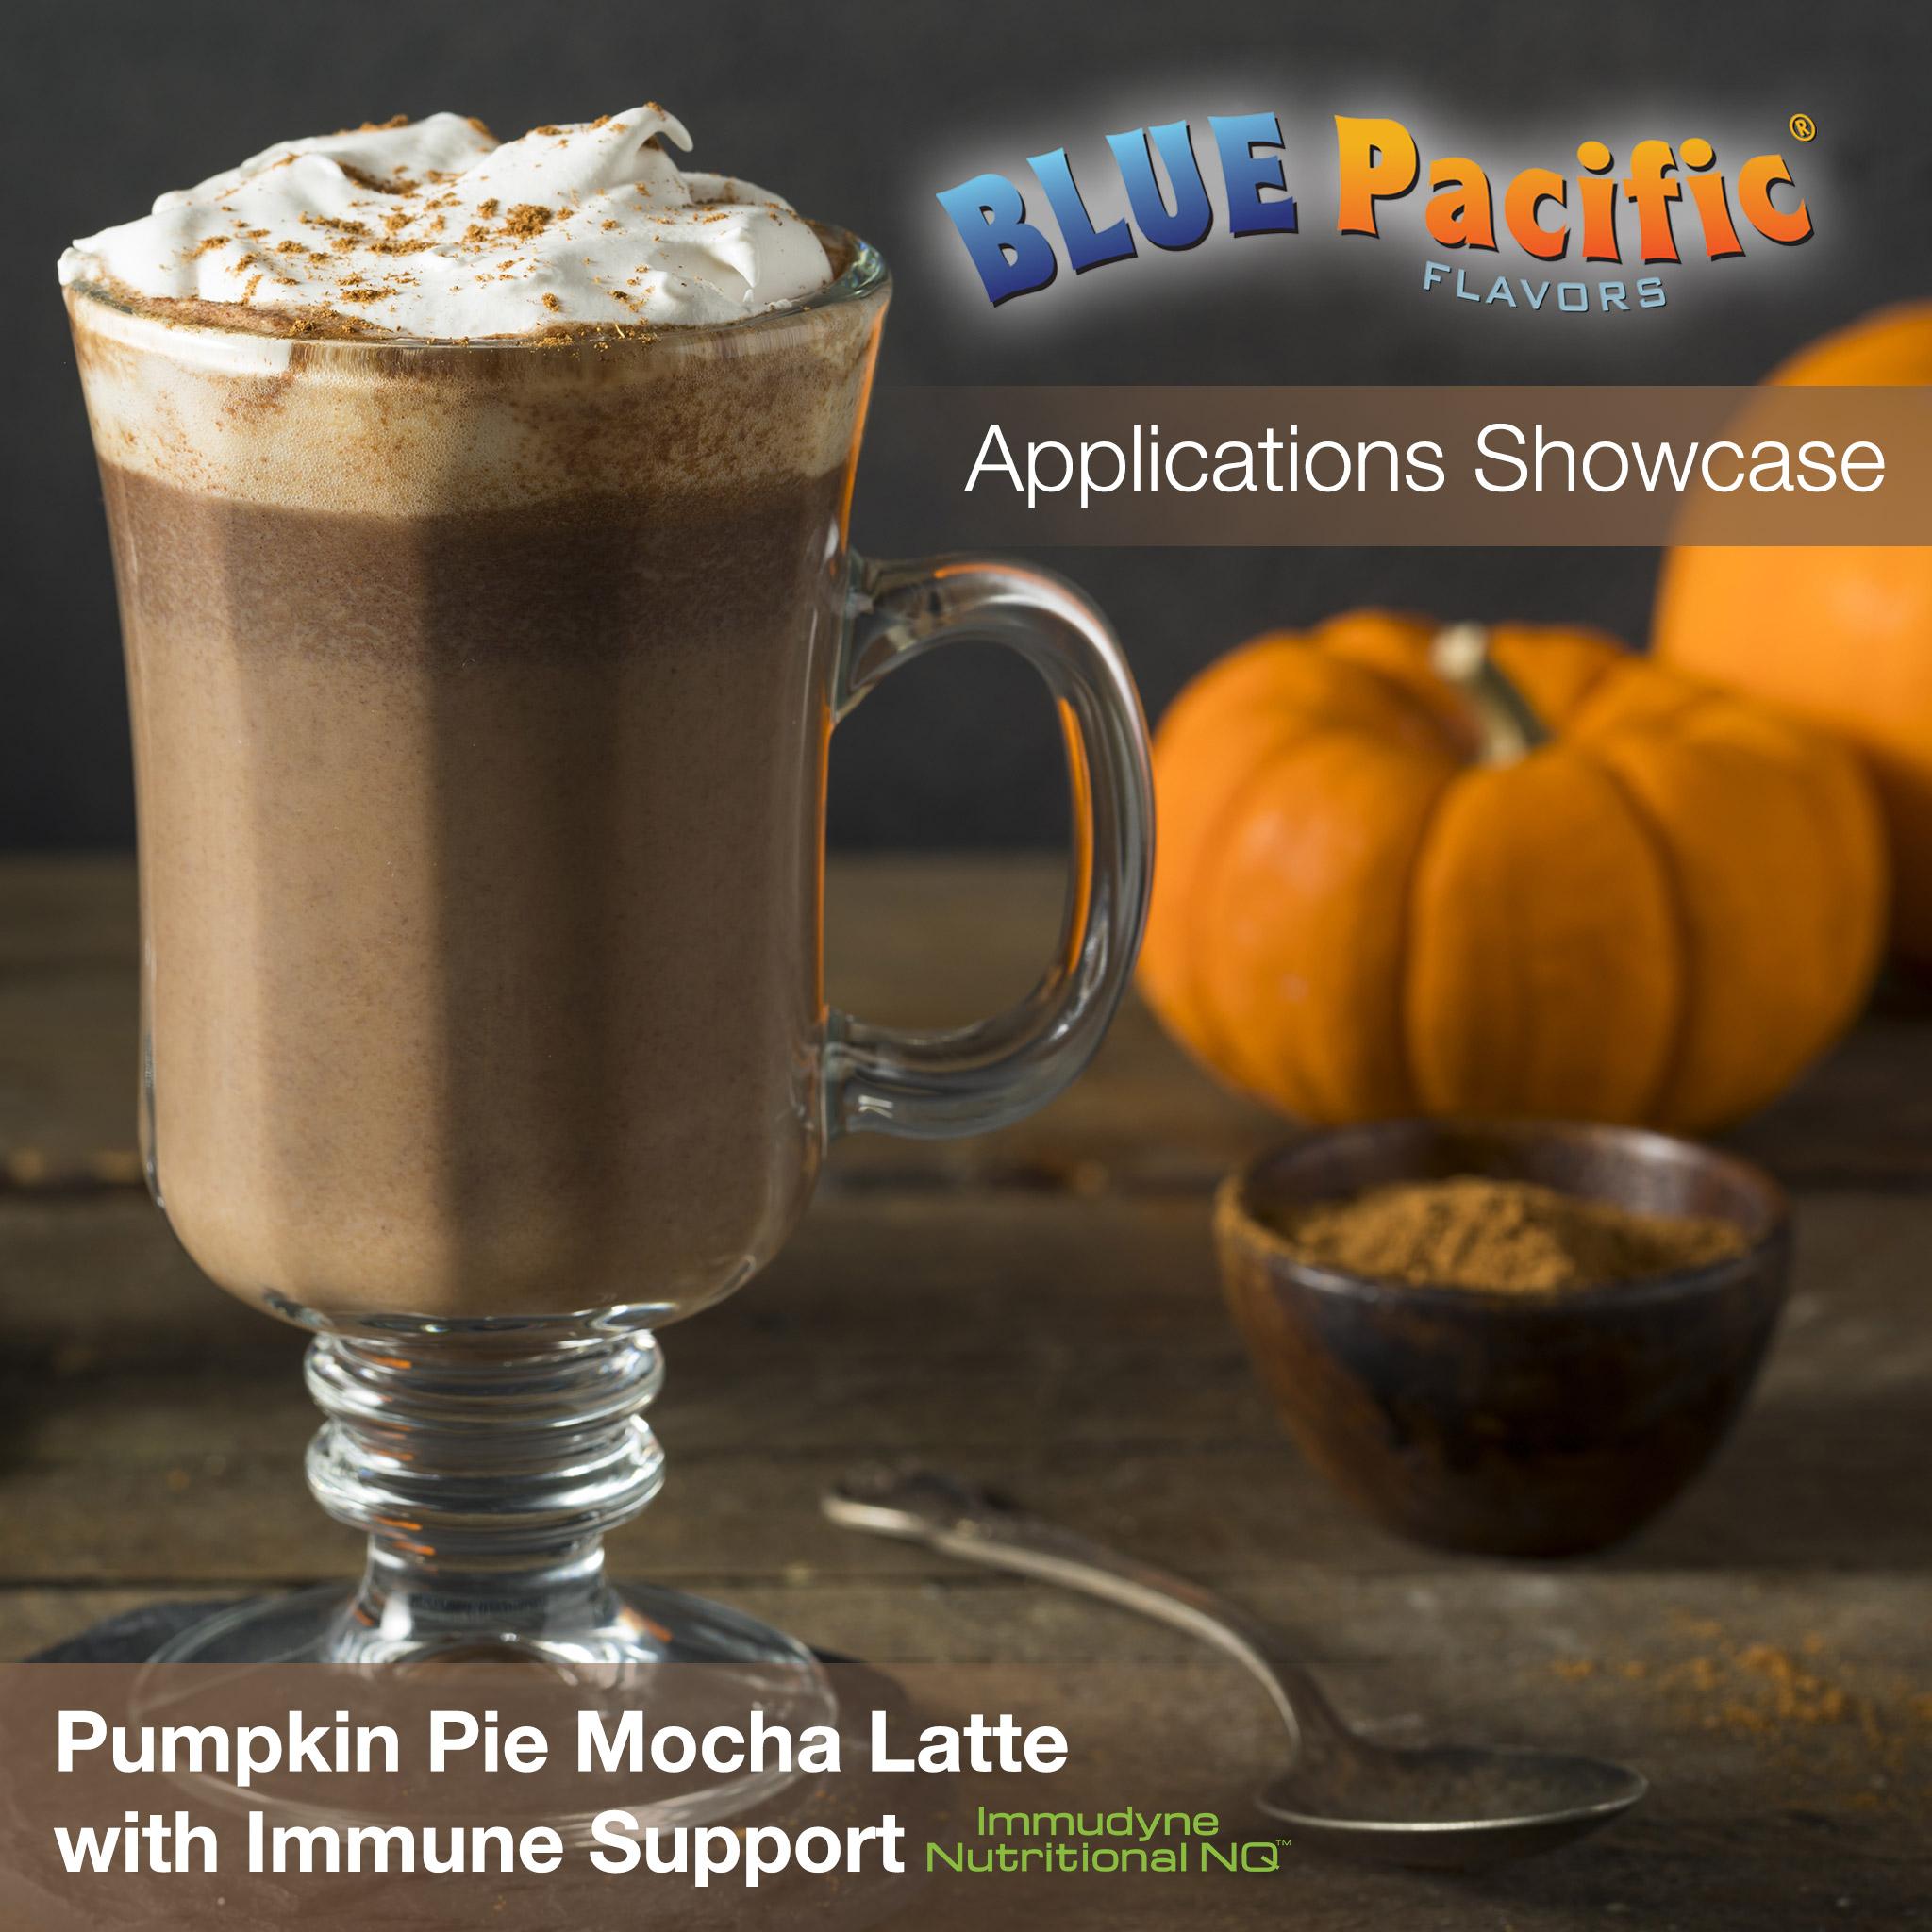 Pumpkin Pie Latte Applications Showcase